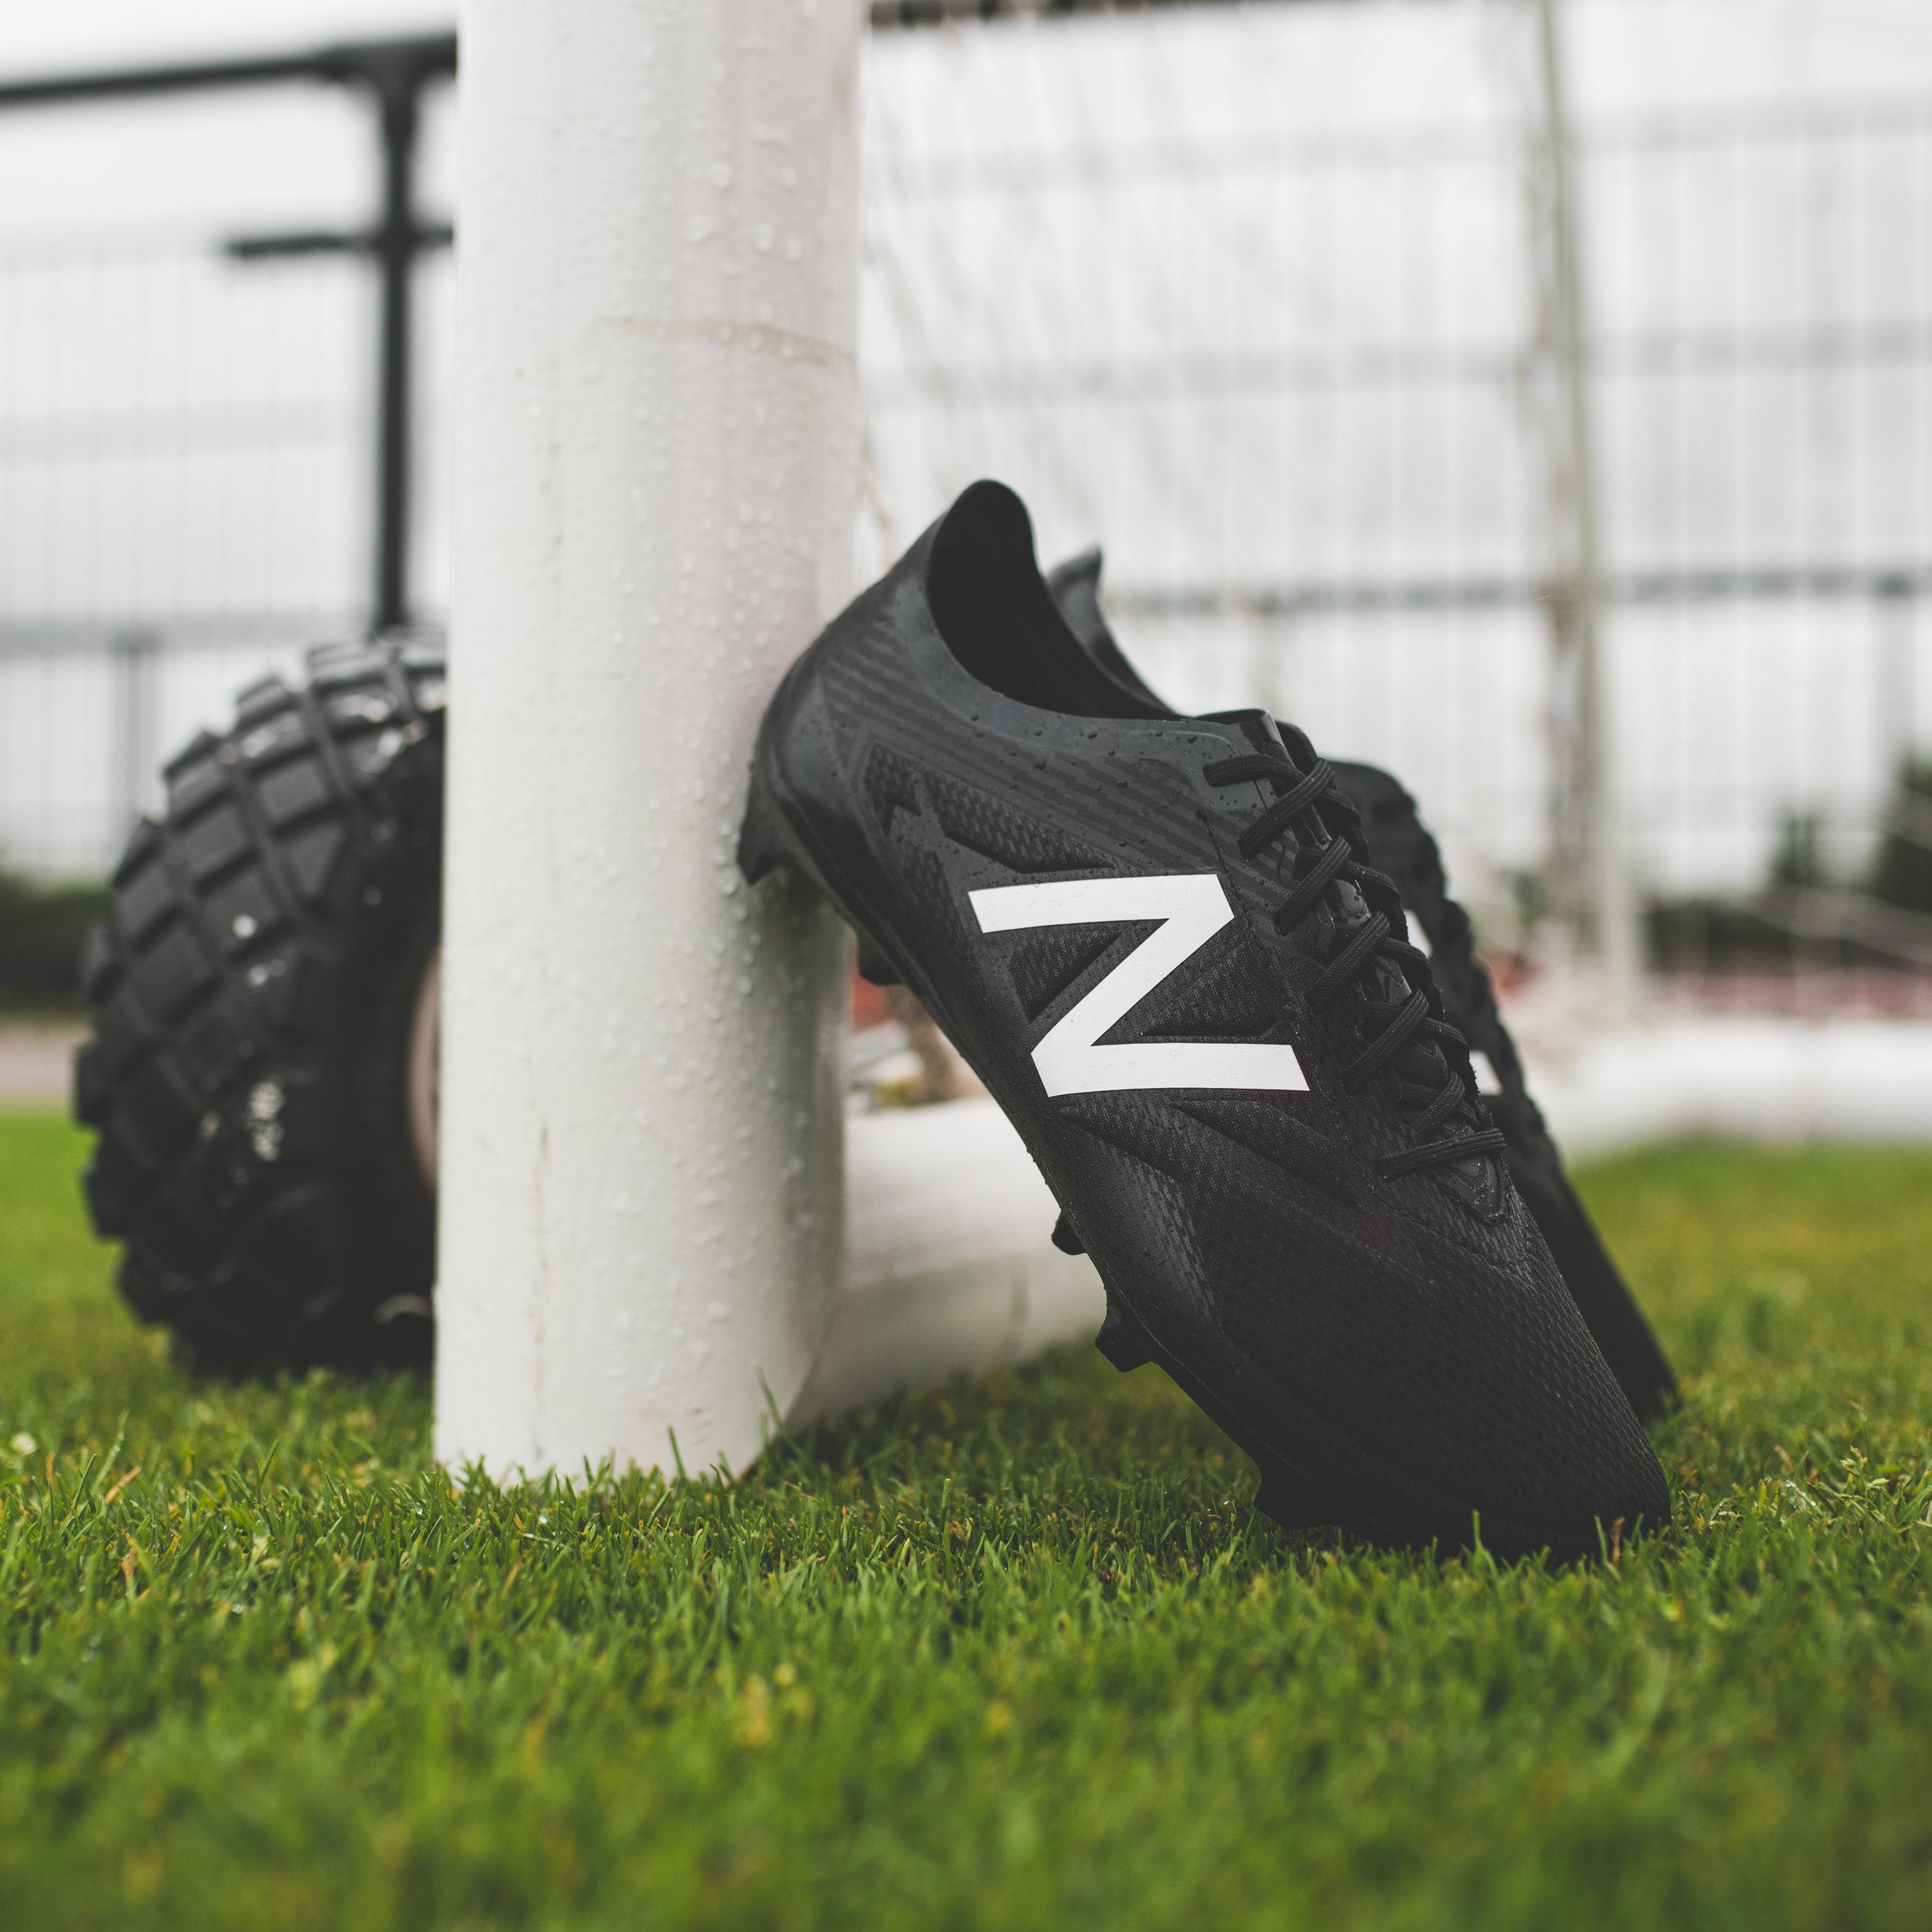 NBFootball_LiverpoolFCAcademy_AllShots_Cropped_28-6-17_TAL-202.jpg